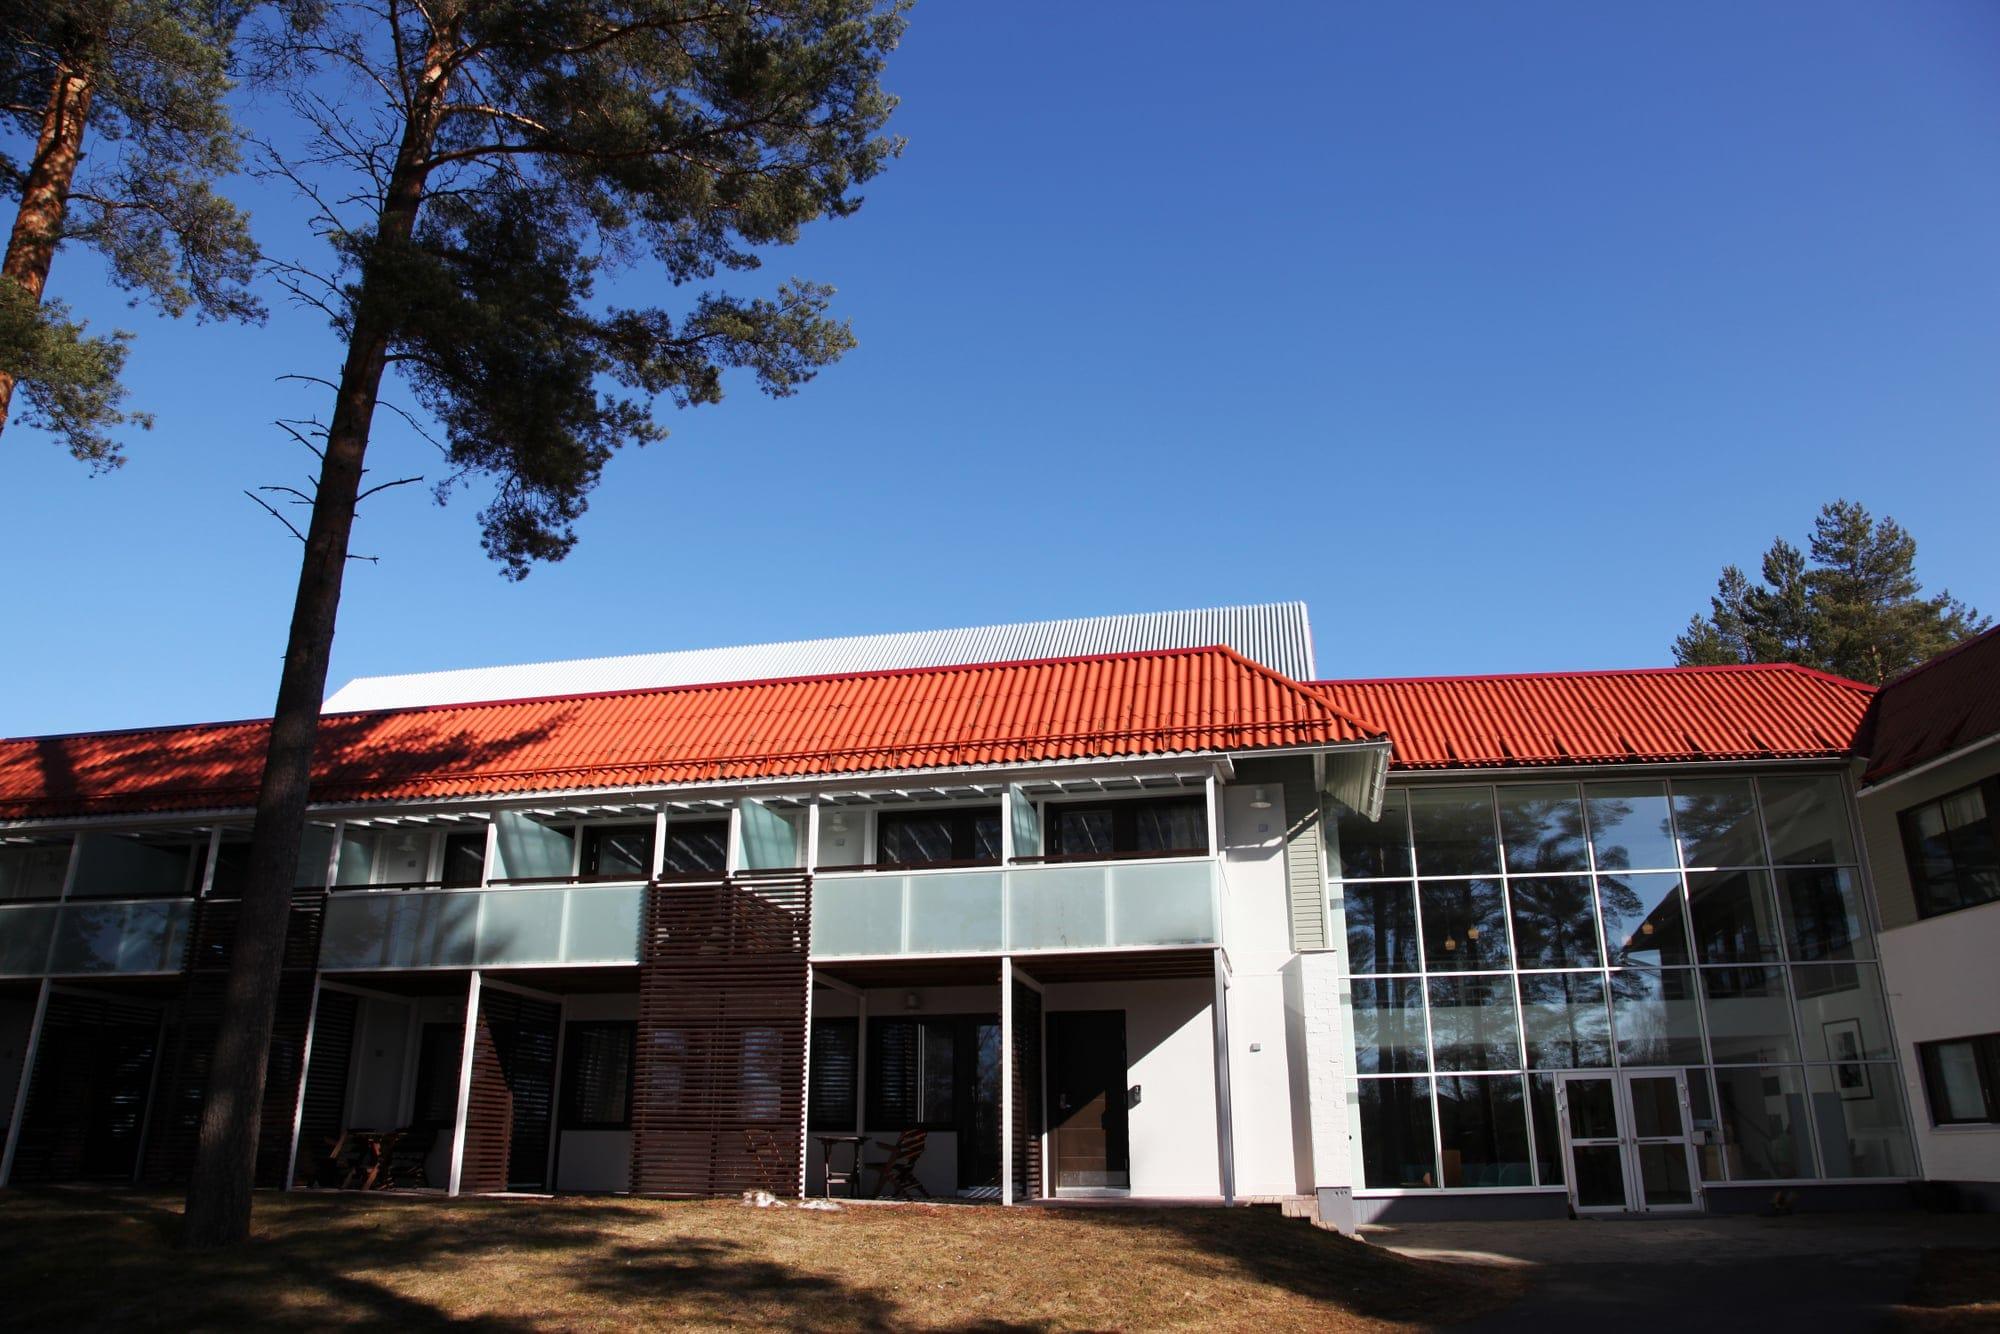 Anttolanhovi hotel 2-001